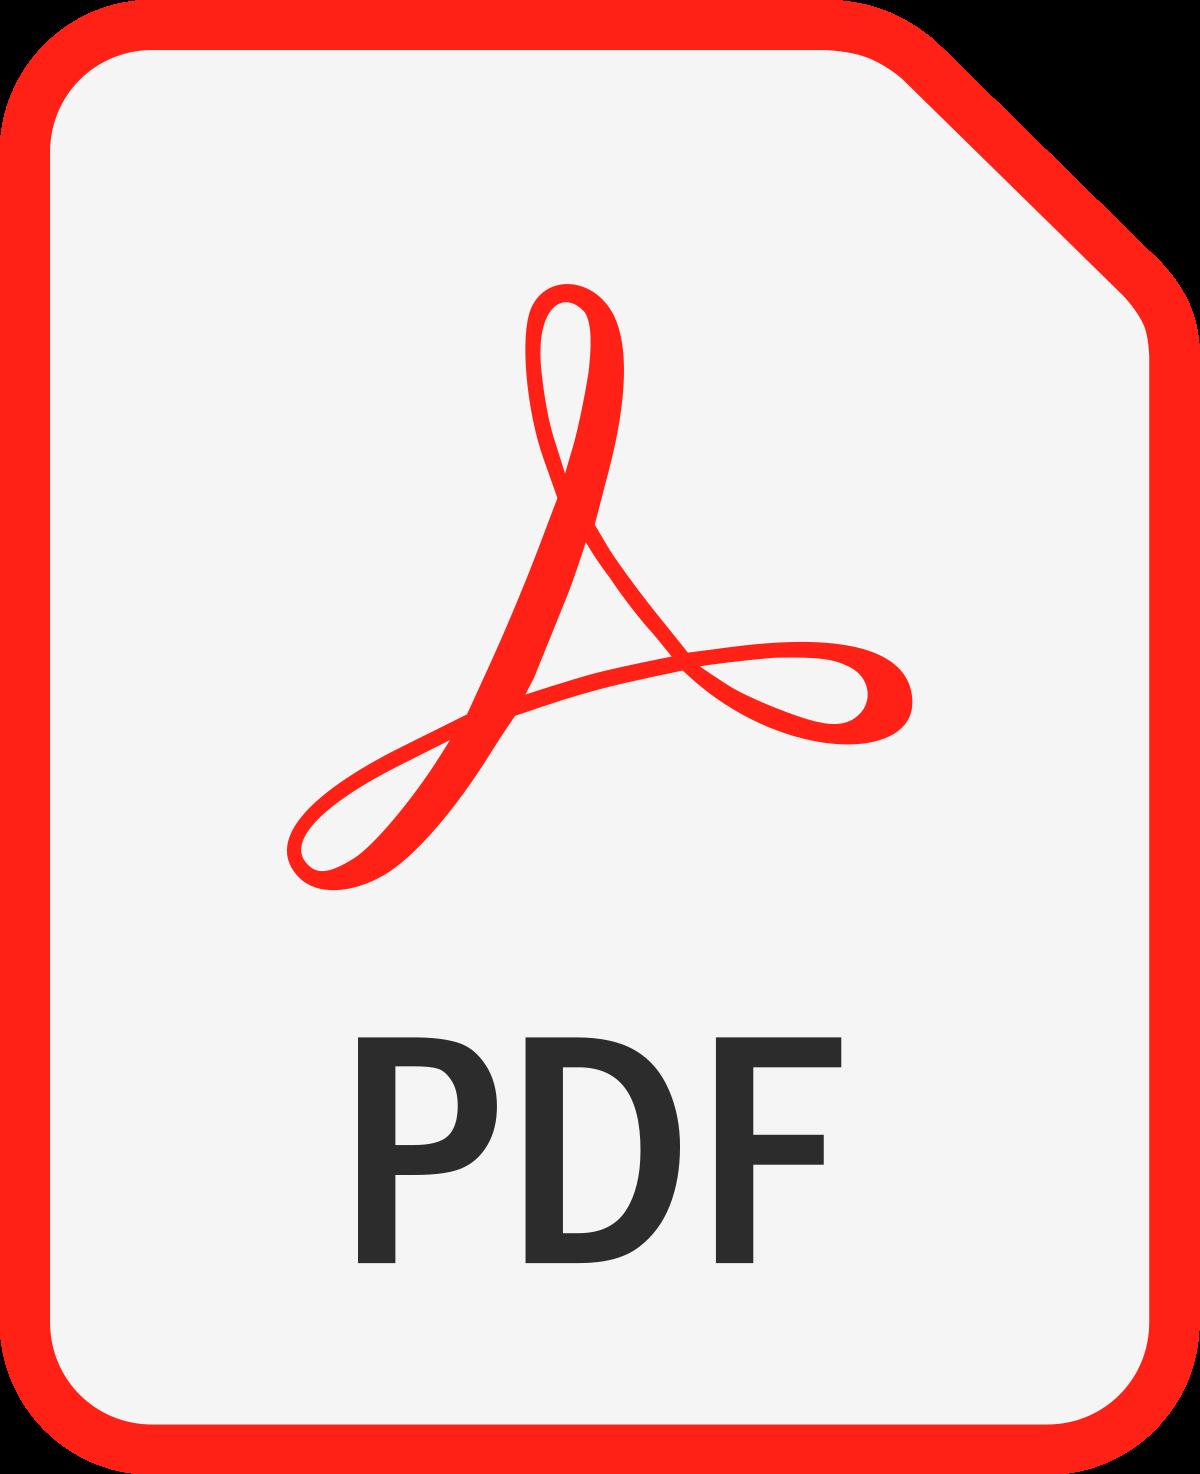 Dokumenty ke stažení{lang}Download{lang}Dokumente zum Herunterladen{lang}Dokumenty do pobrania